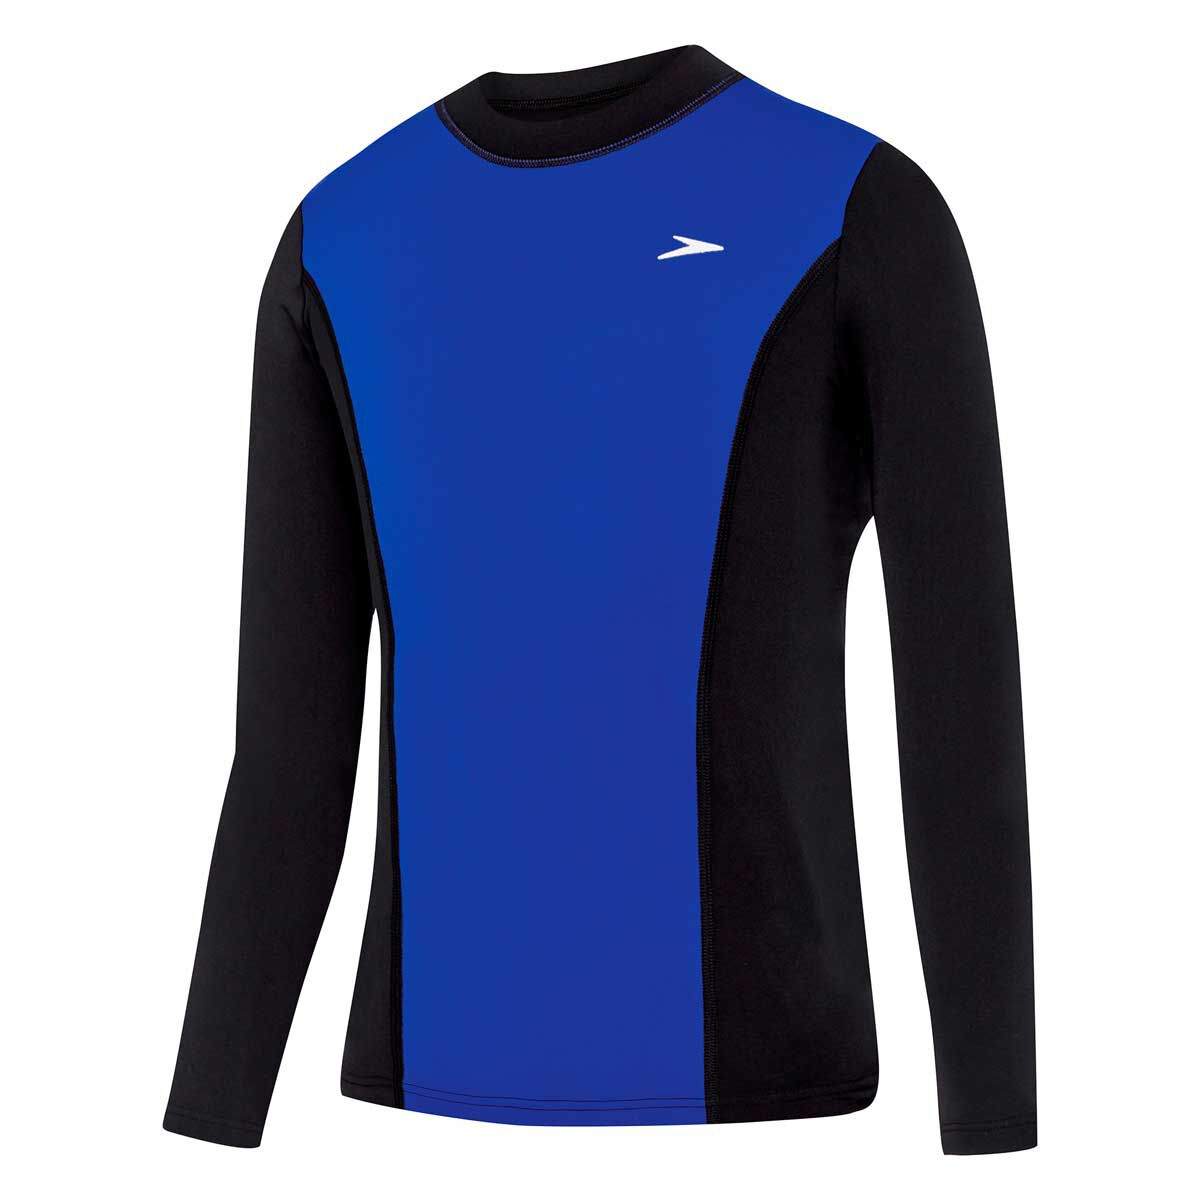 Berlei Shapewear Free Lace Thigh Slimming Control Brief Knicker B5014 Black